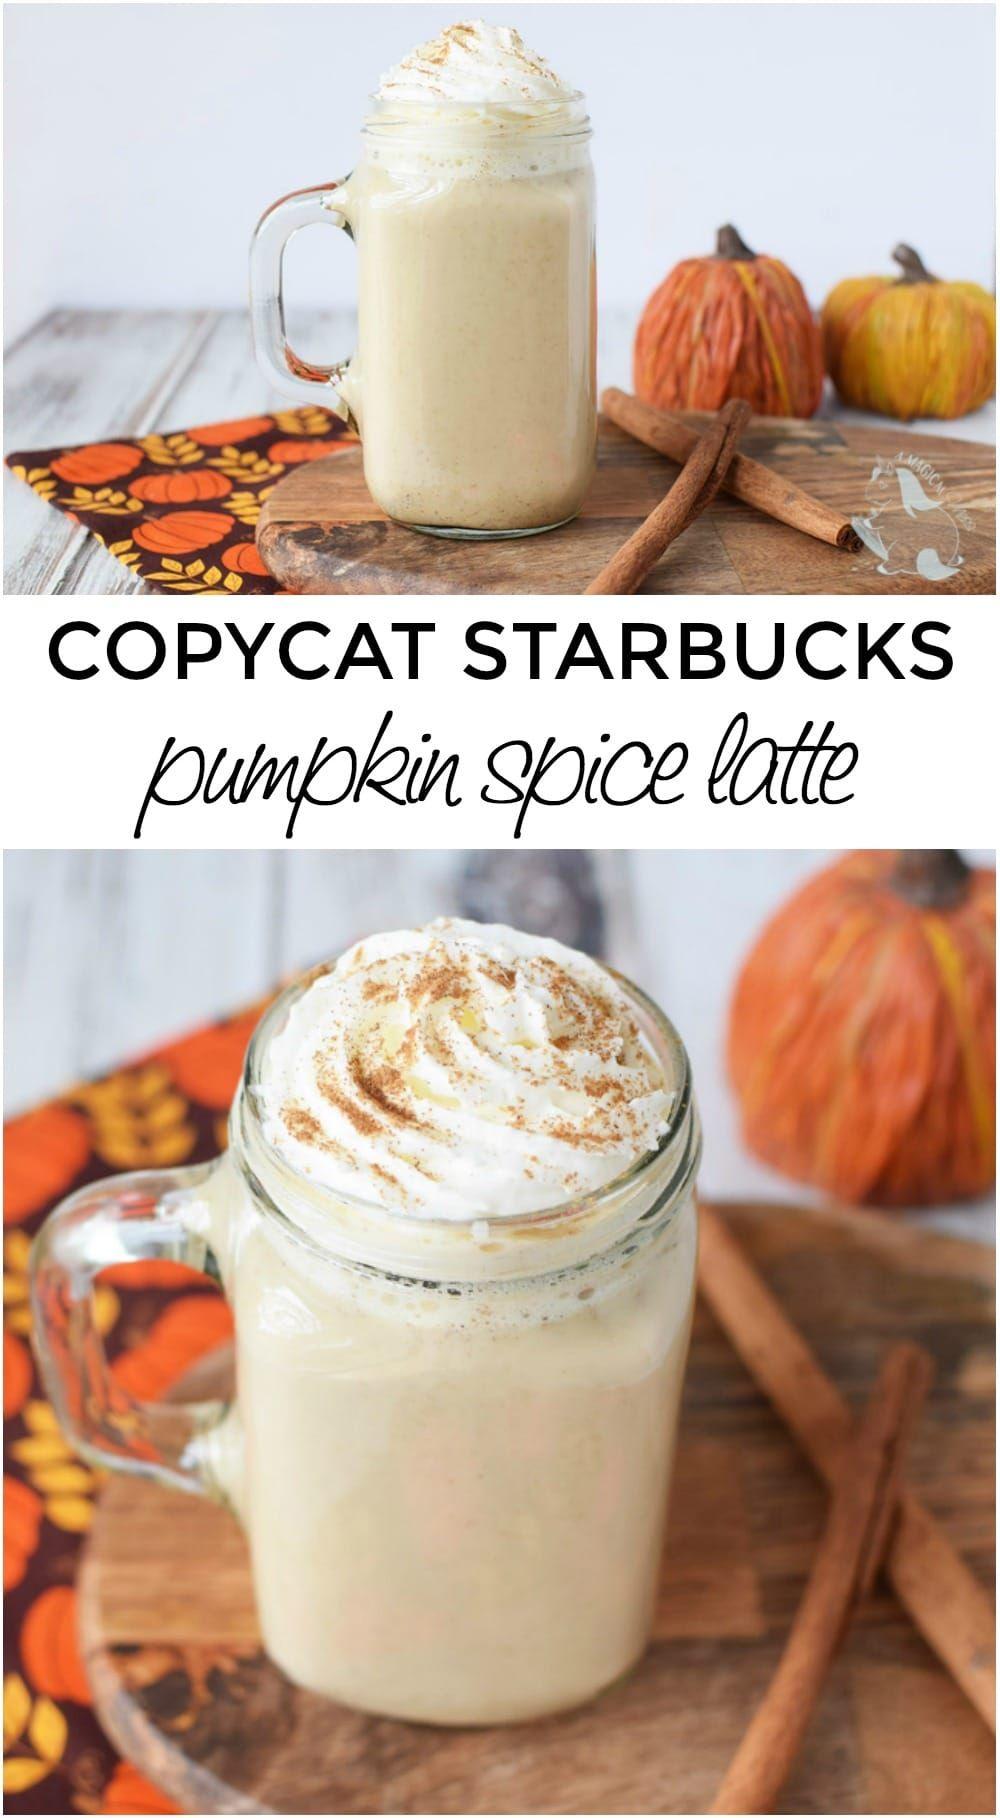 Photo of Copycat Starbucks Pumpkin Spice Latte Recipe